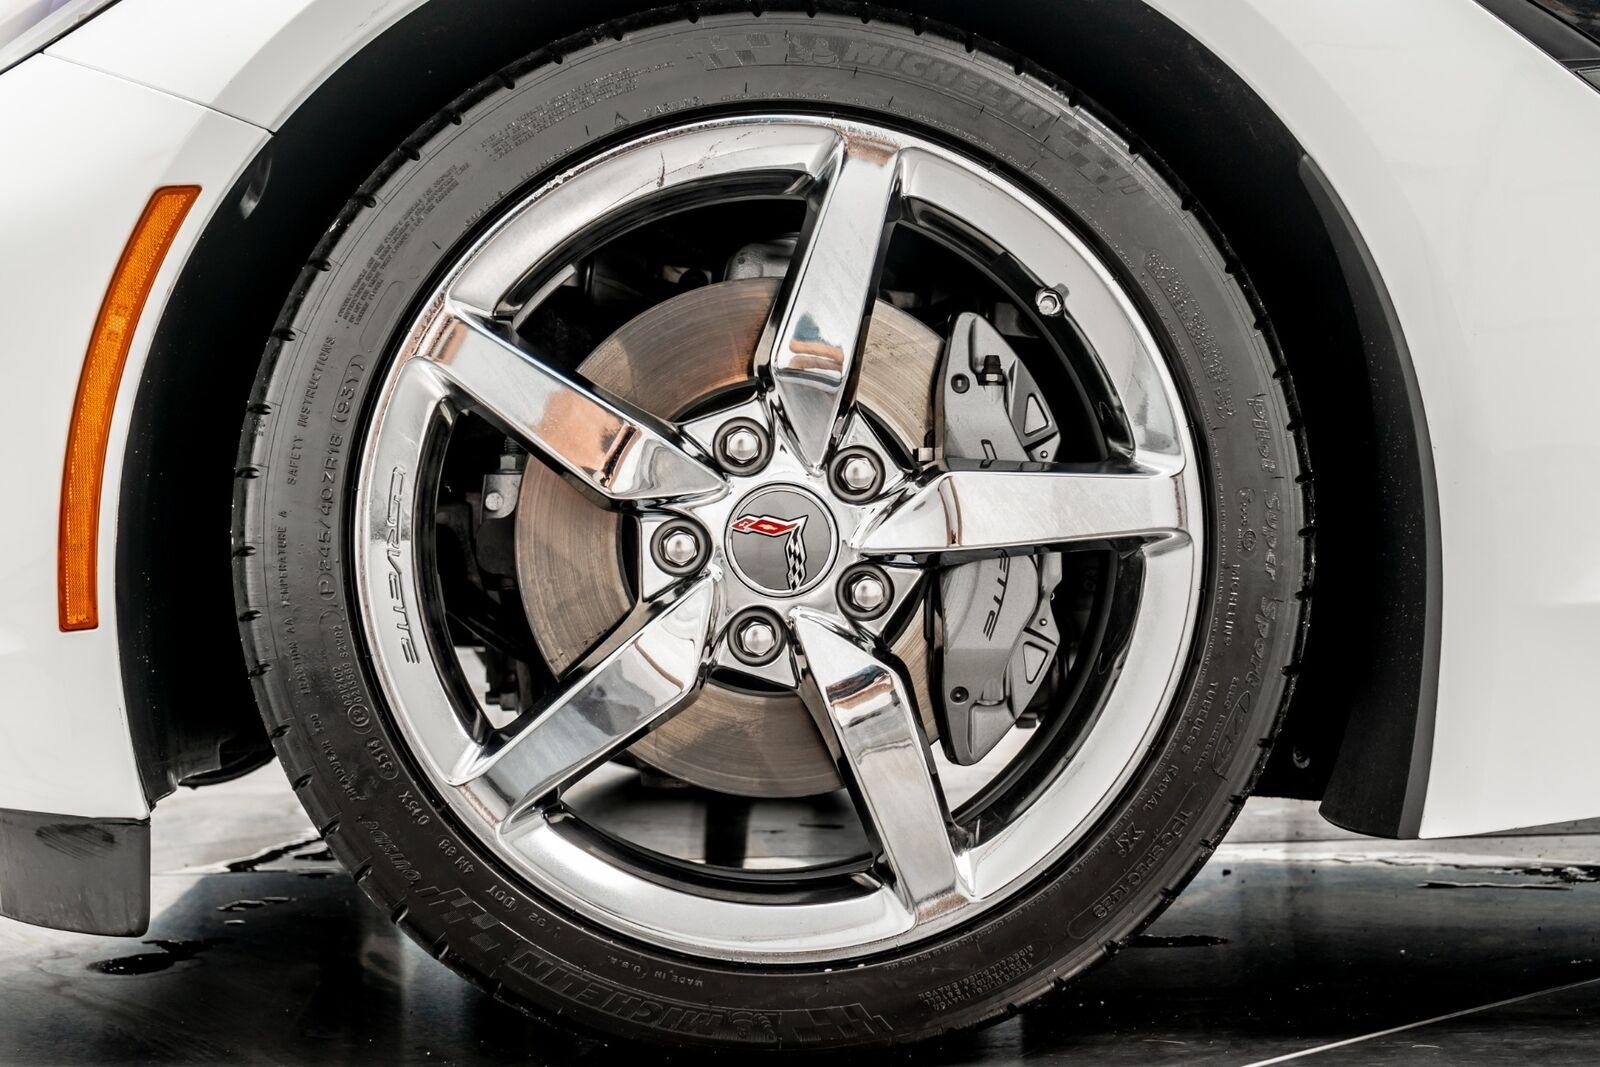 2015 White Chevrolet Corvette Convertible 3LT   C7 Corvette Photo 9